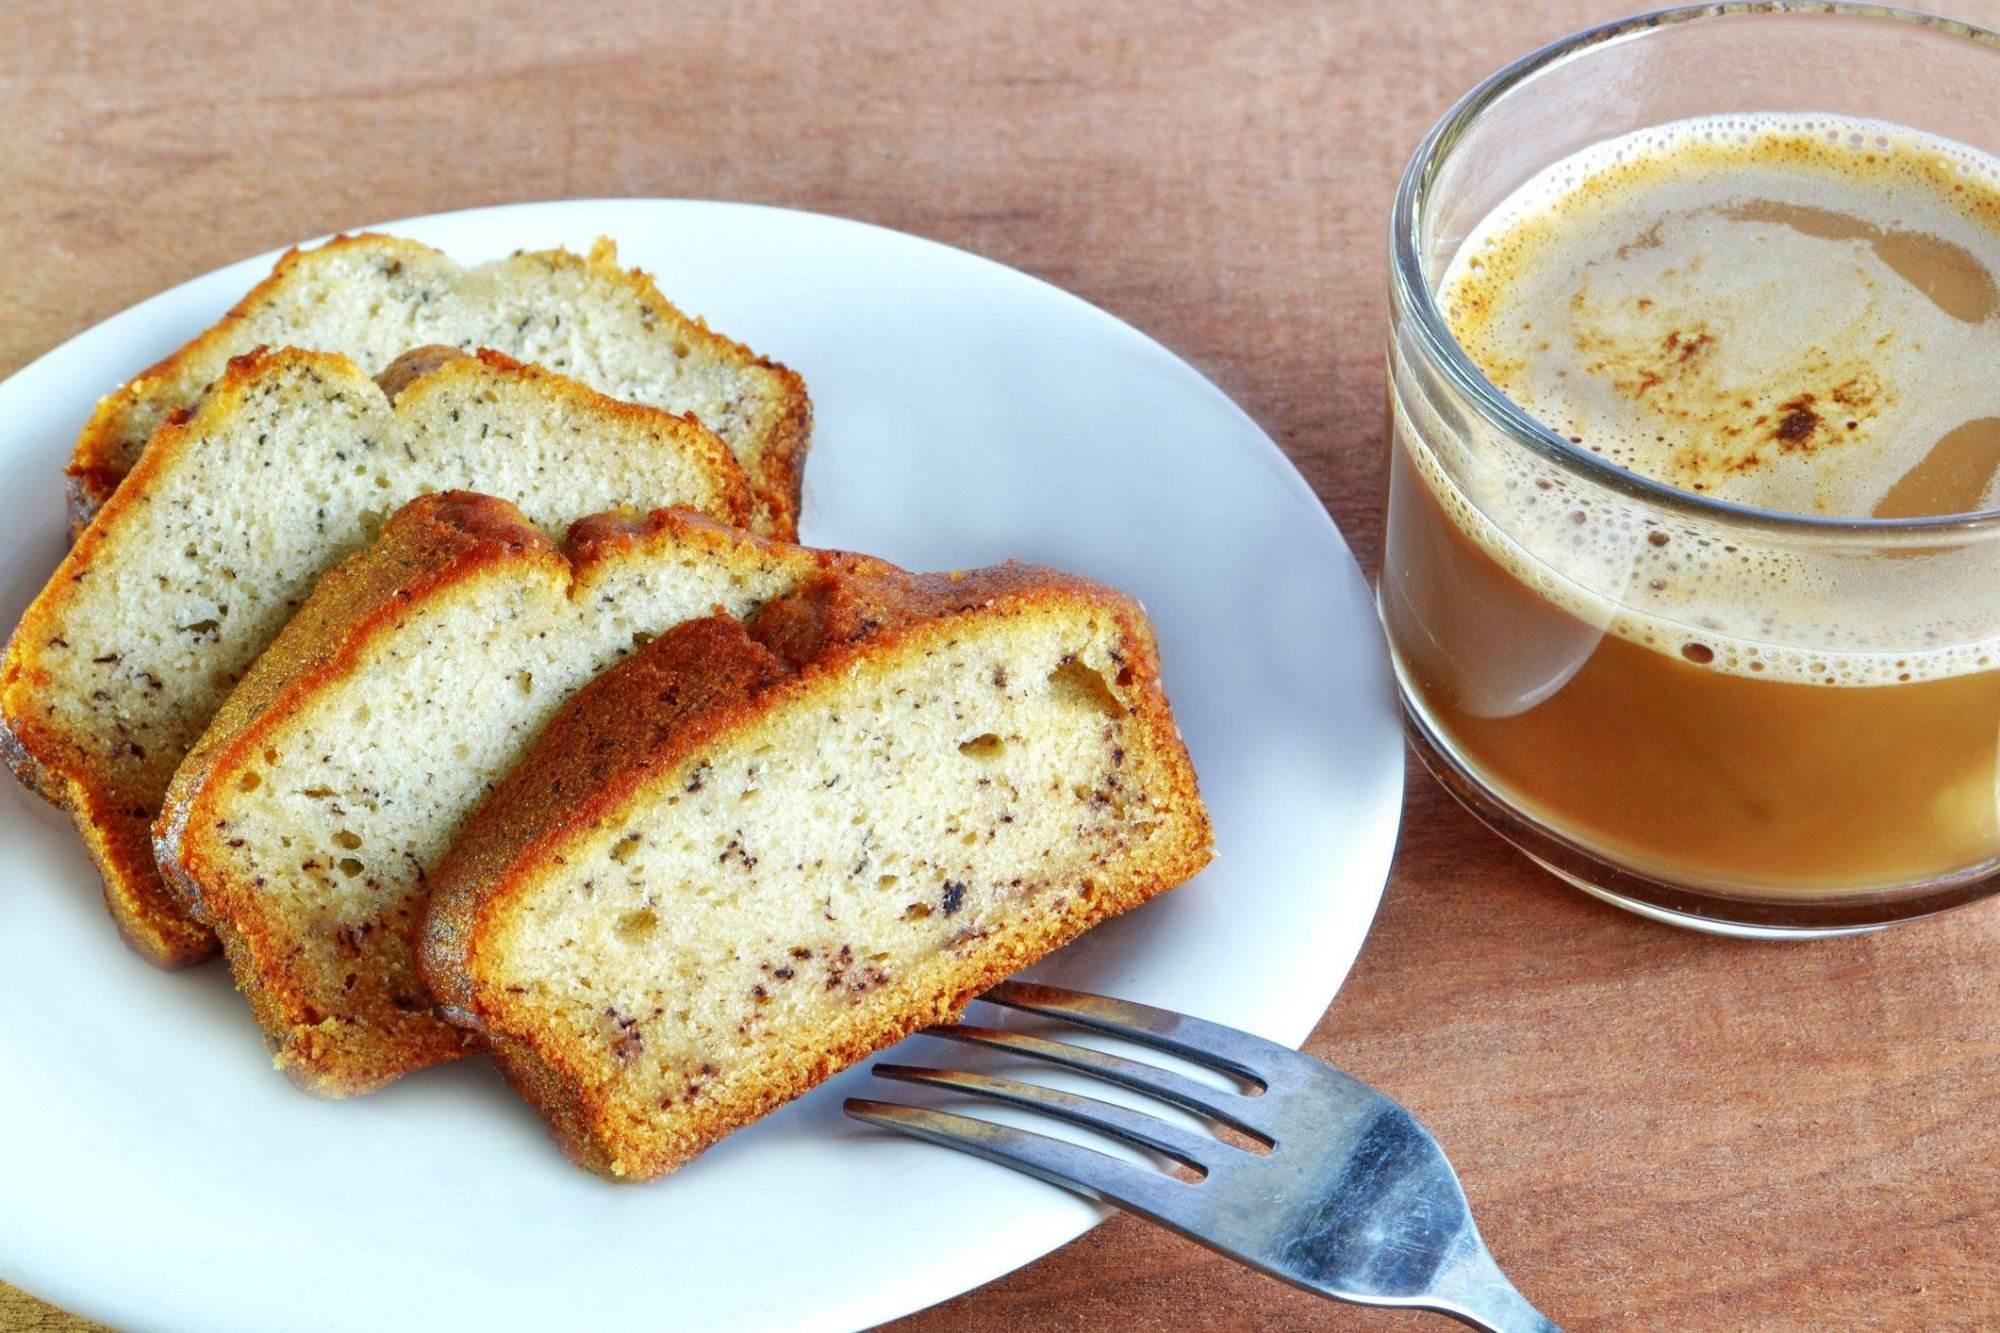 banana cake and a cup of coffee. Farm Pride Eggs Recipe